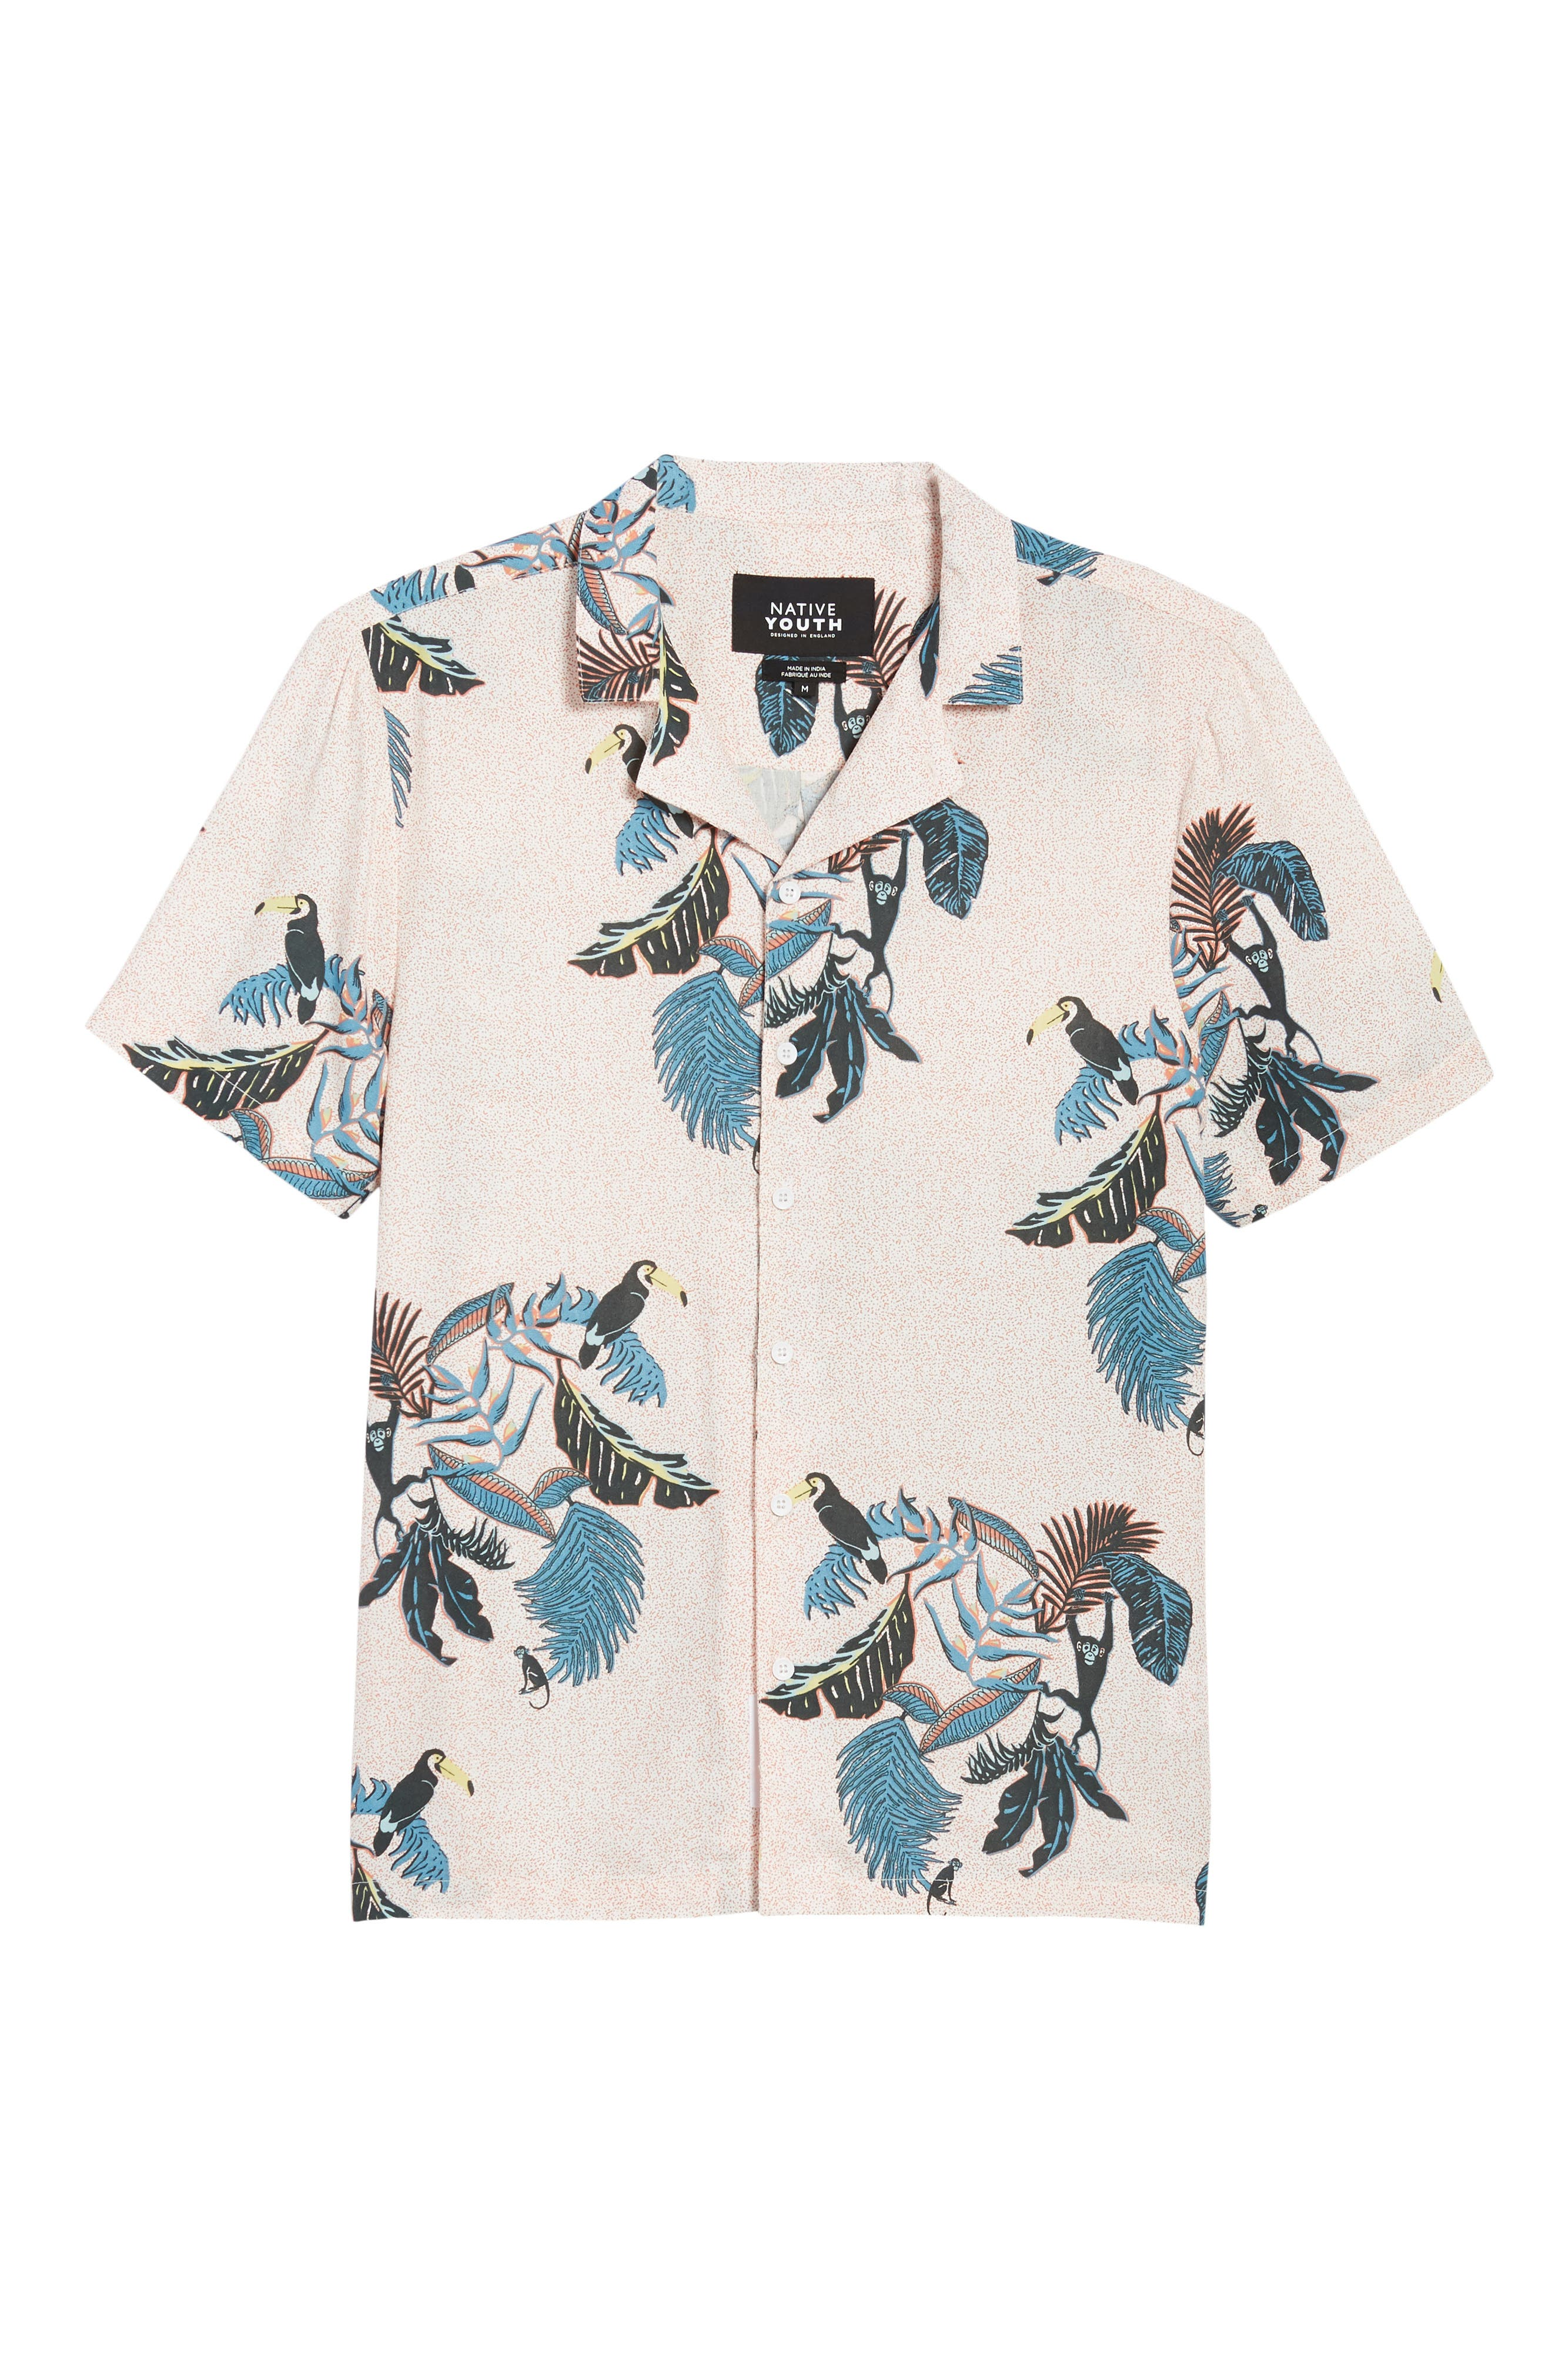 Jangala Woven Shirt,                             Alternate thumbnail 6, color,                             PINK